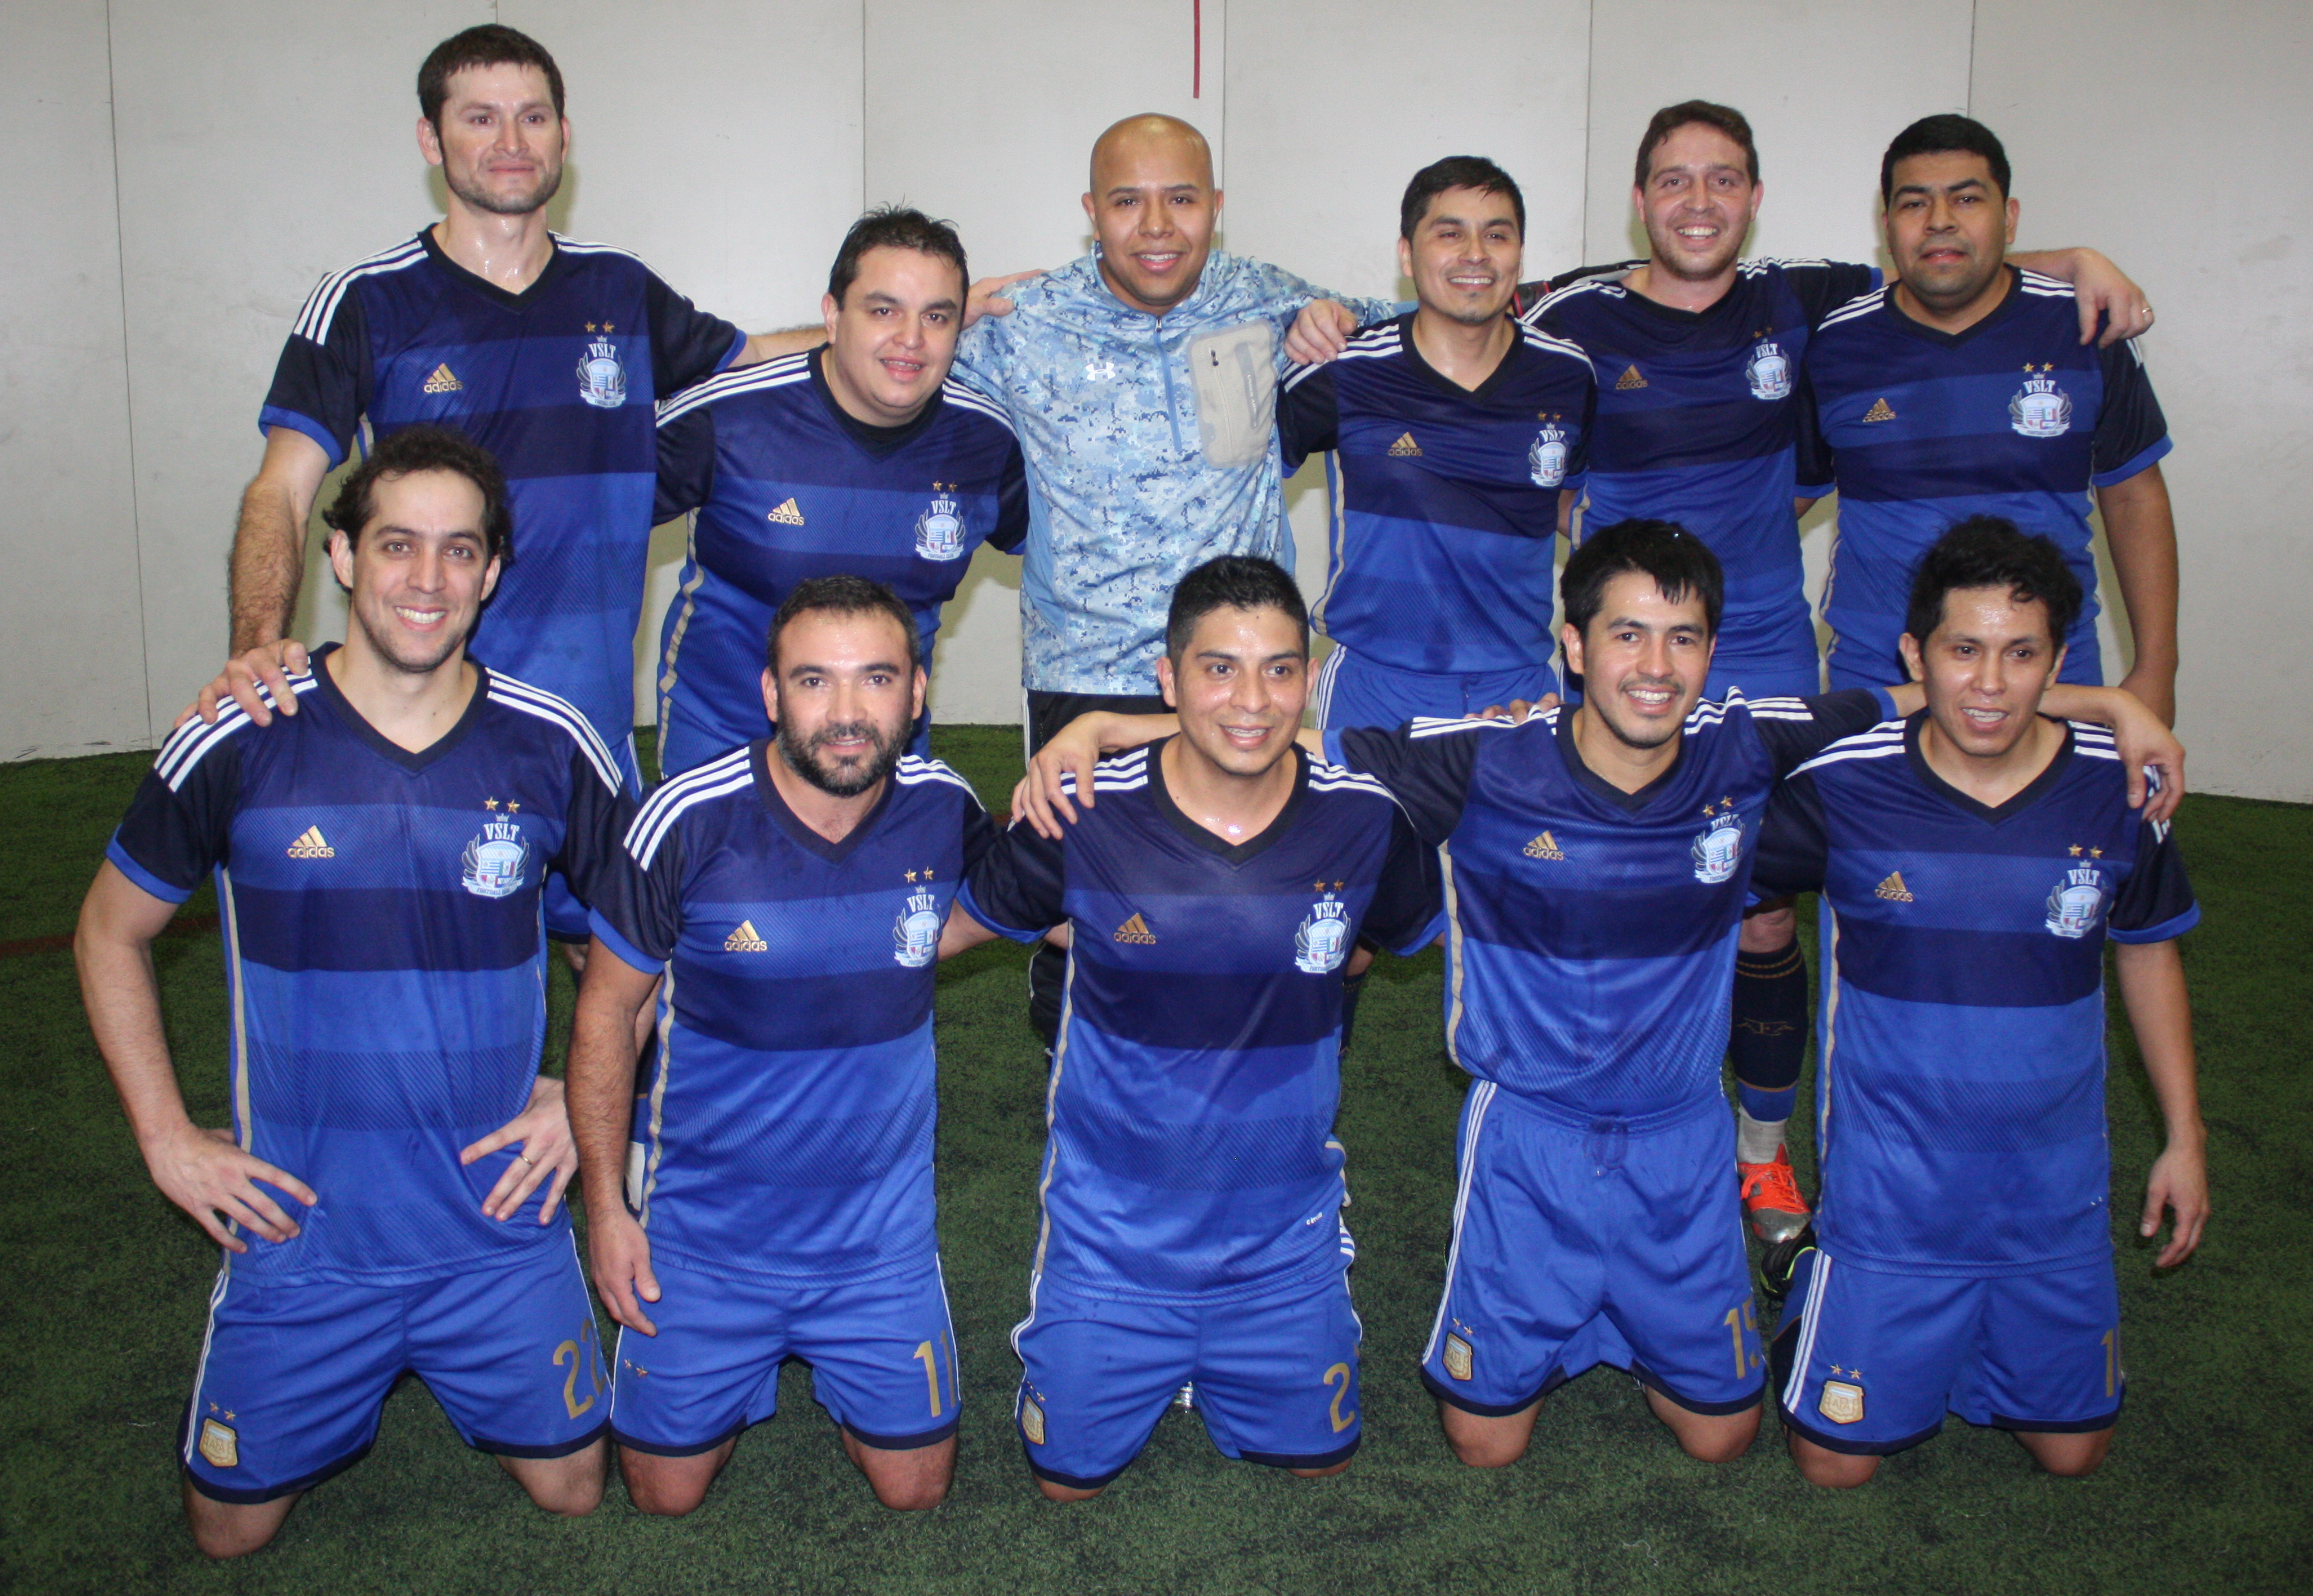 2015 President's Cup Men's Over-30 champions: VSLT FC